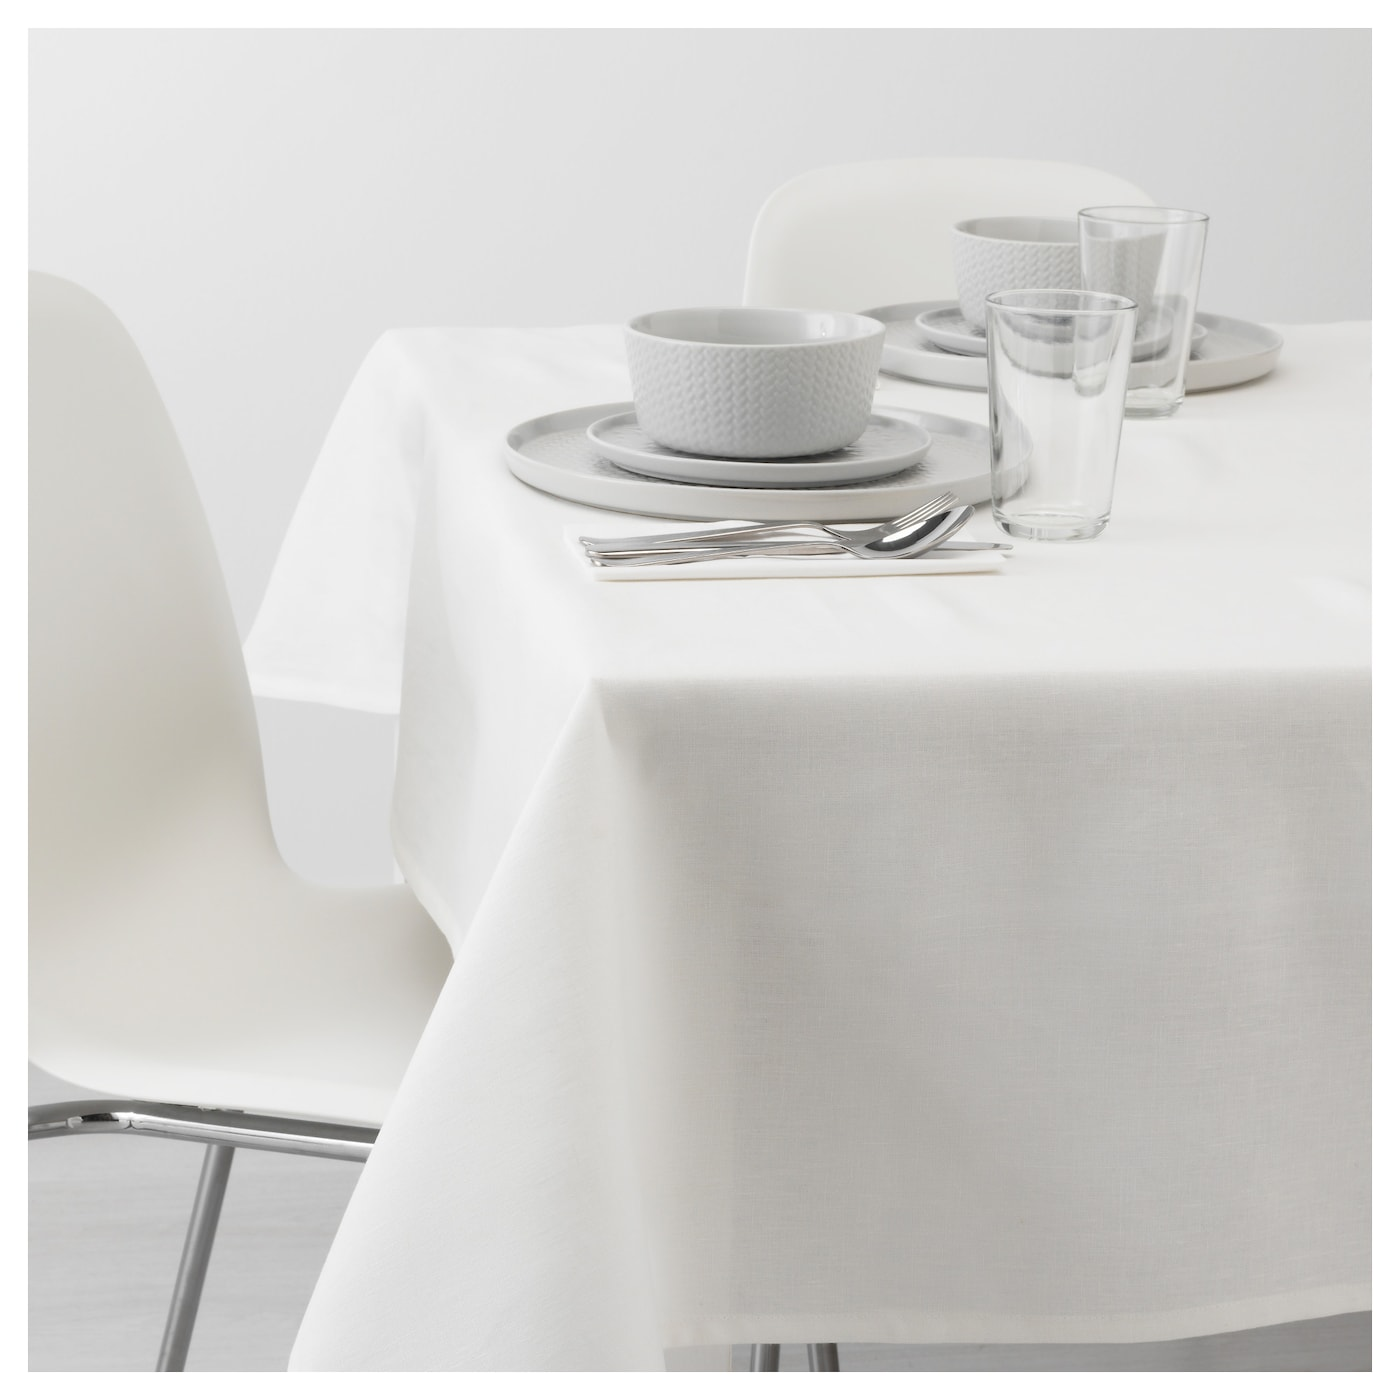 High Quality IKEA VINTER 2017 Tablecloth